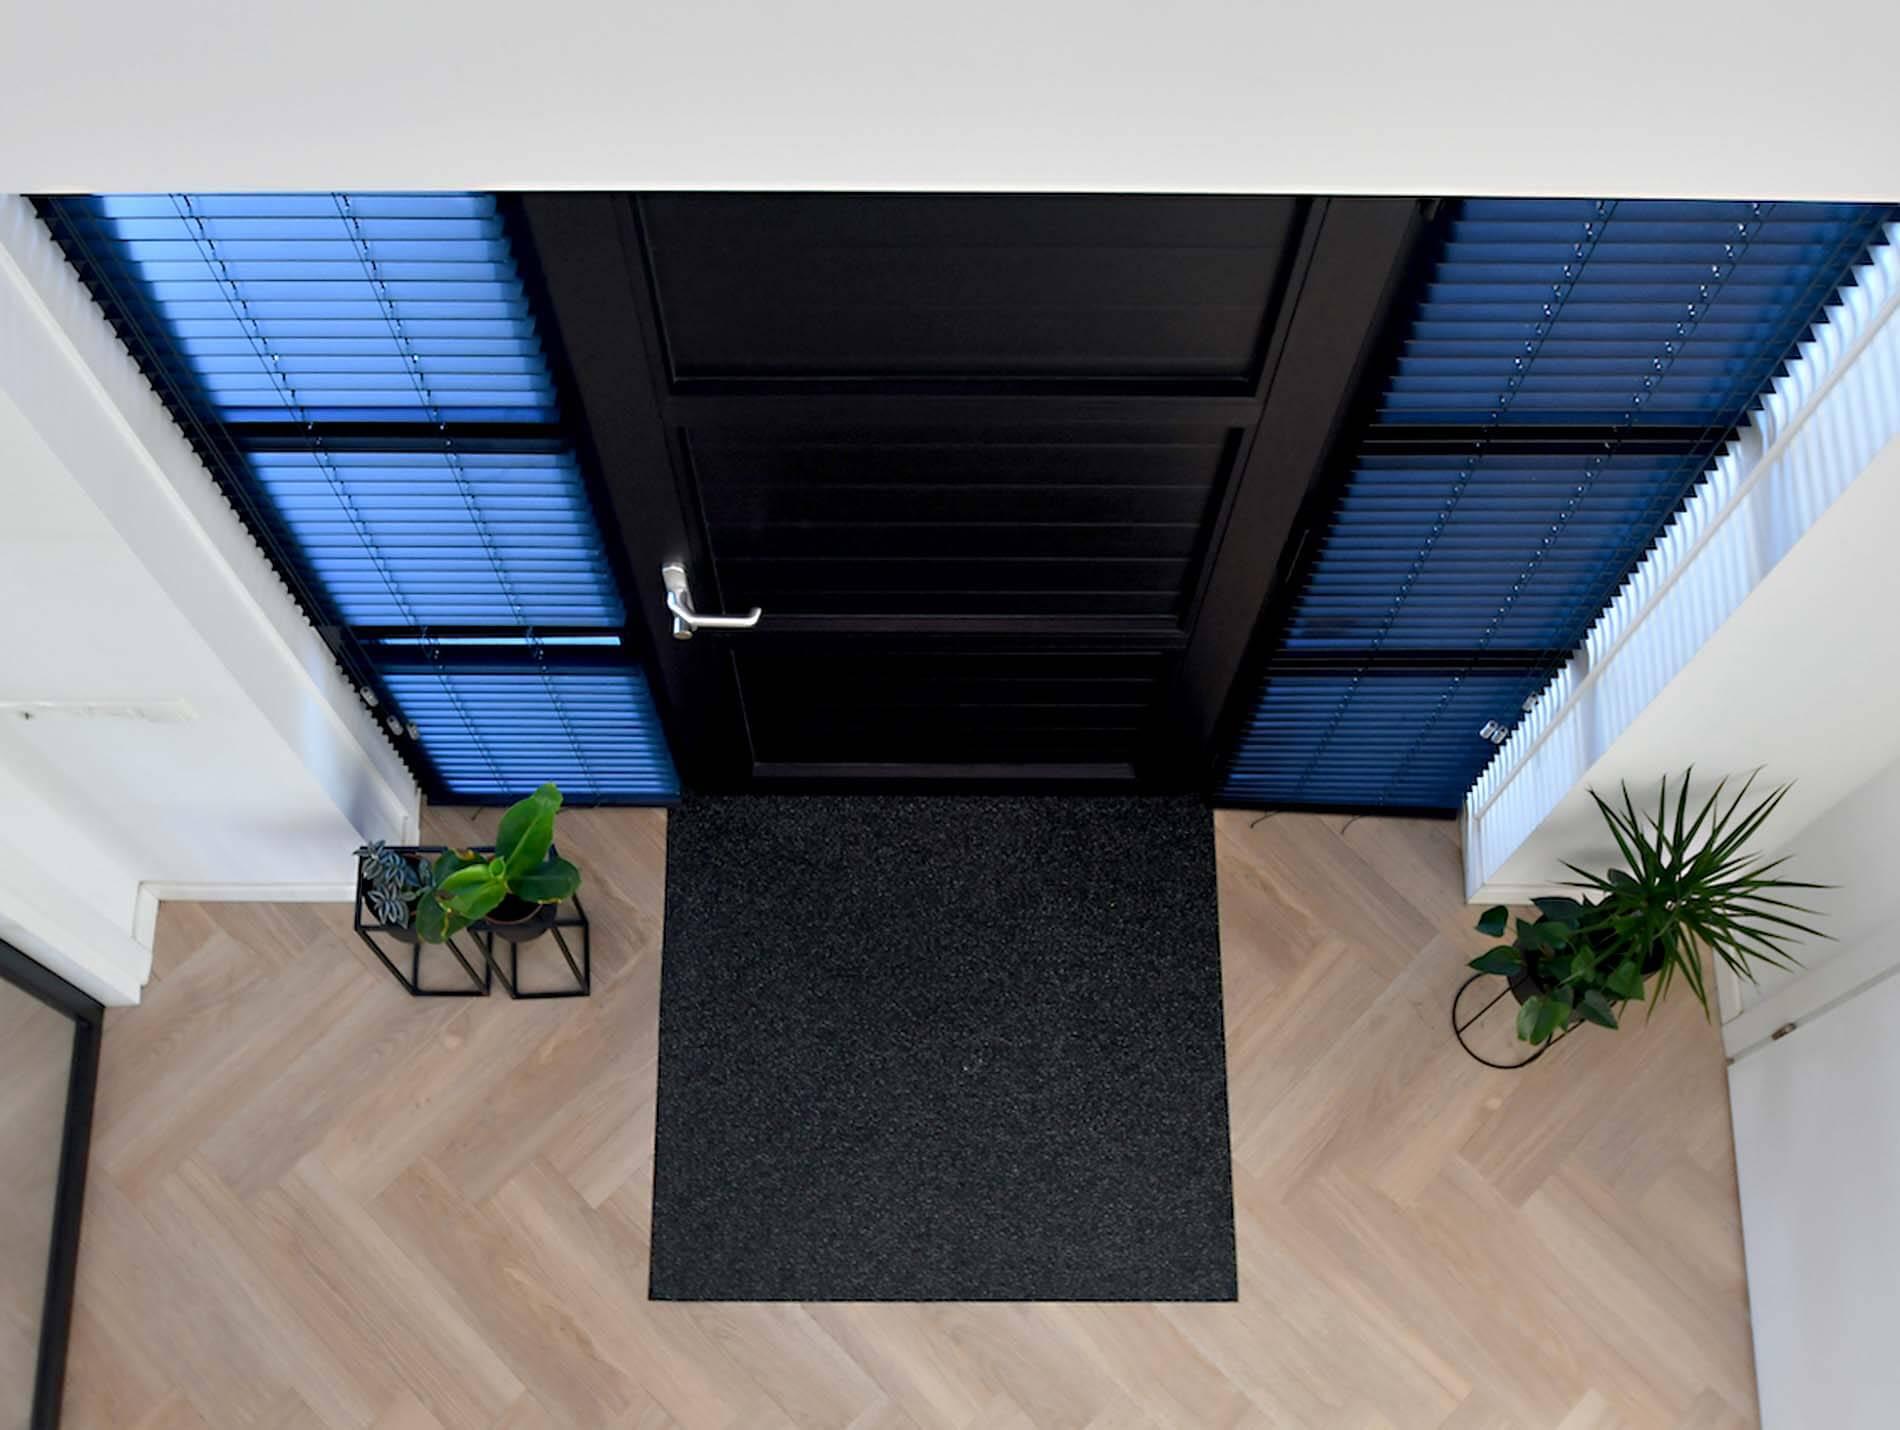 1. interieur-drachten-nieuwbouw-woning-1900x1430p.jpg